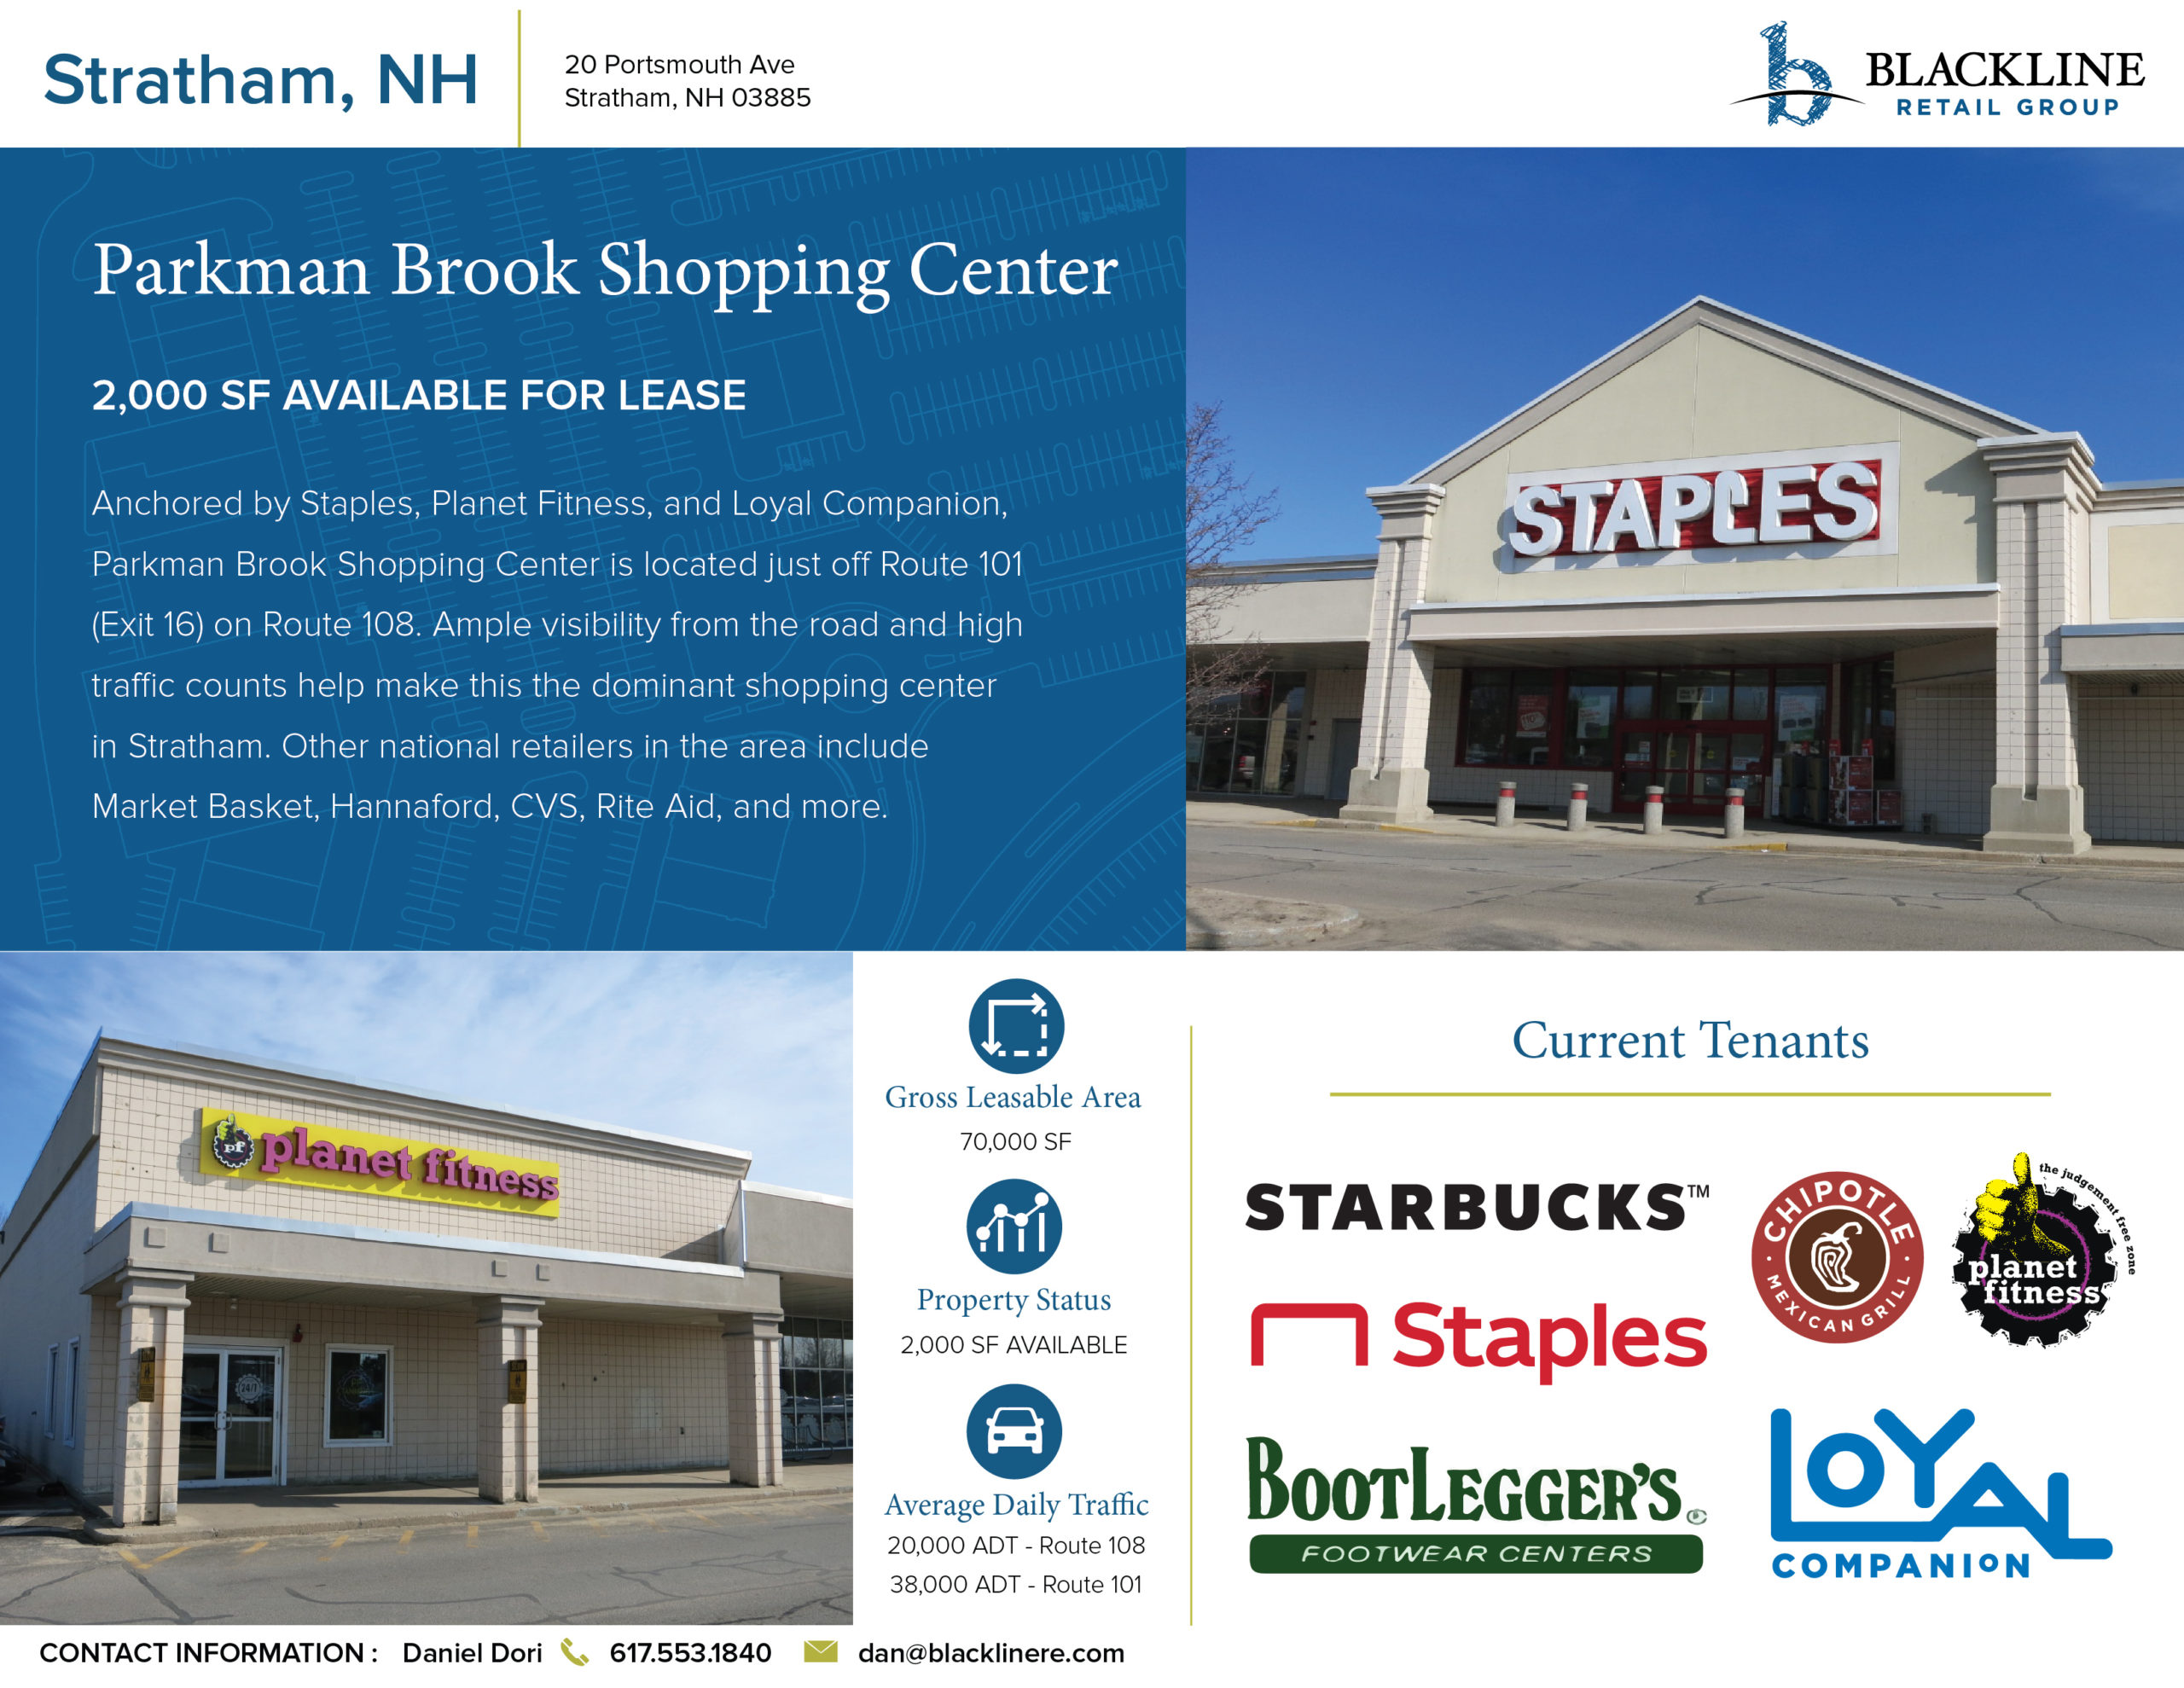 Stratham, Nh Parkman Brook Shopping Center